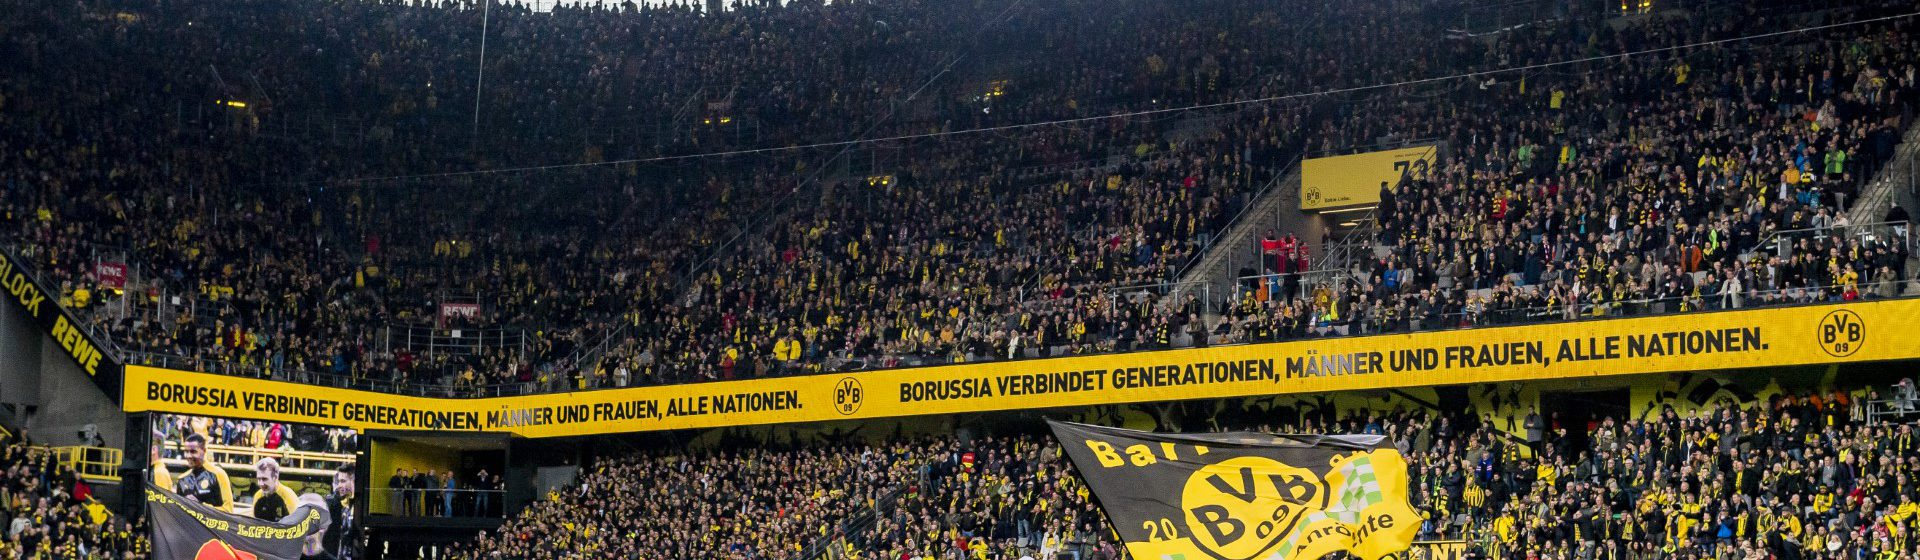 Borussia Dortmund header